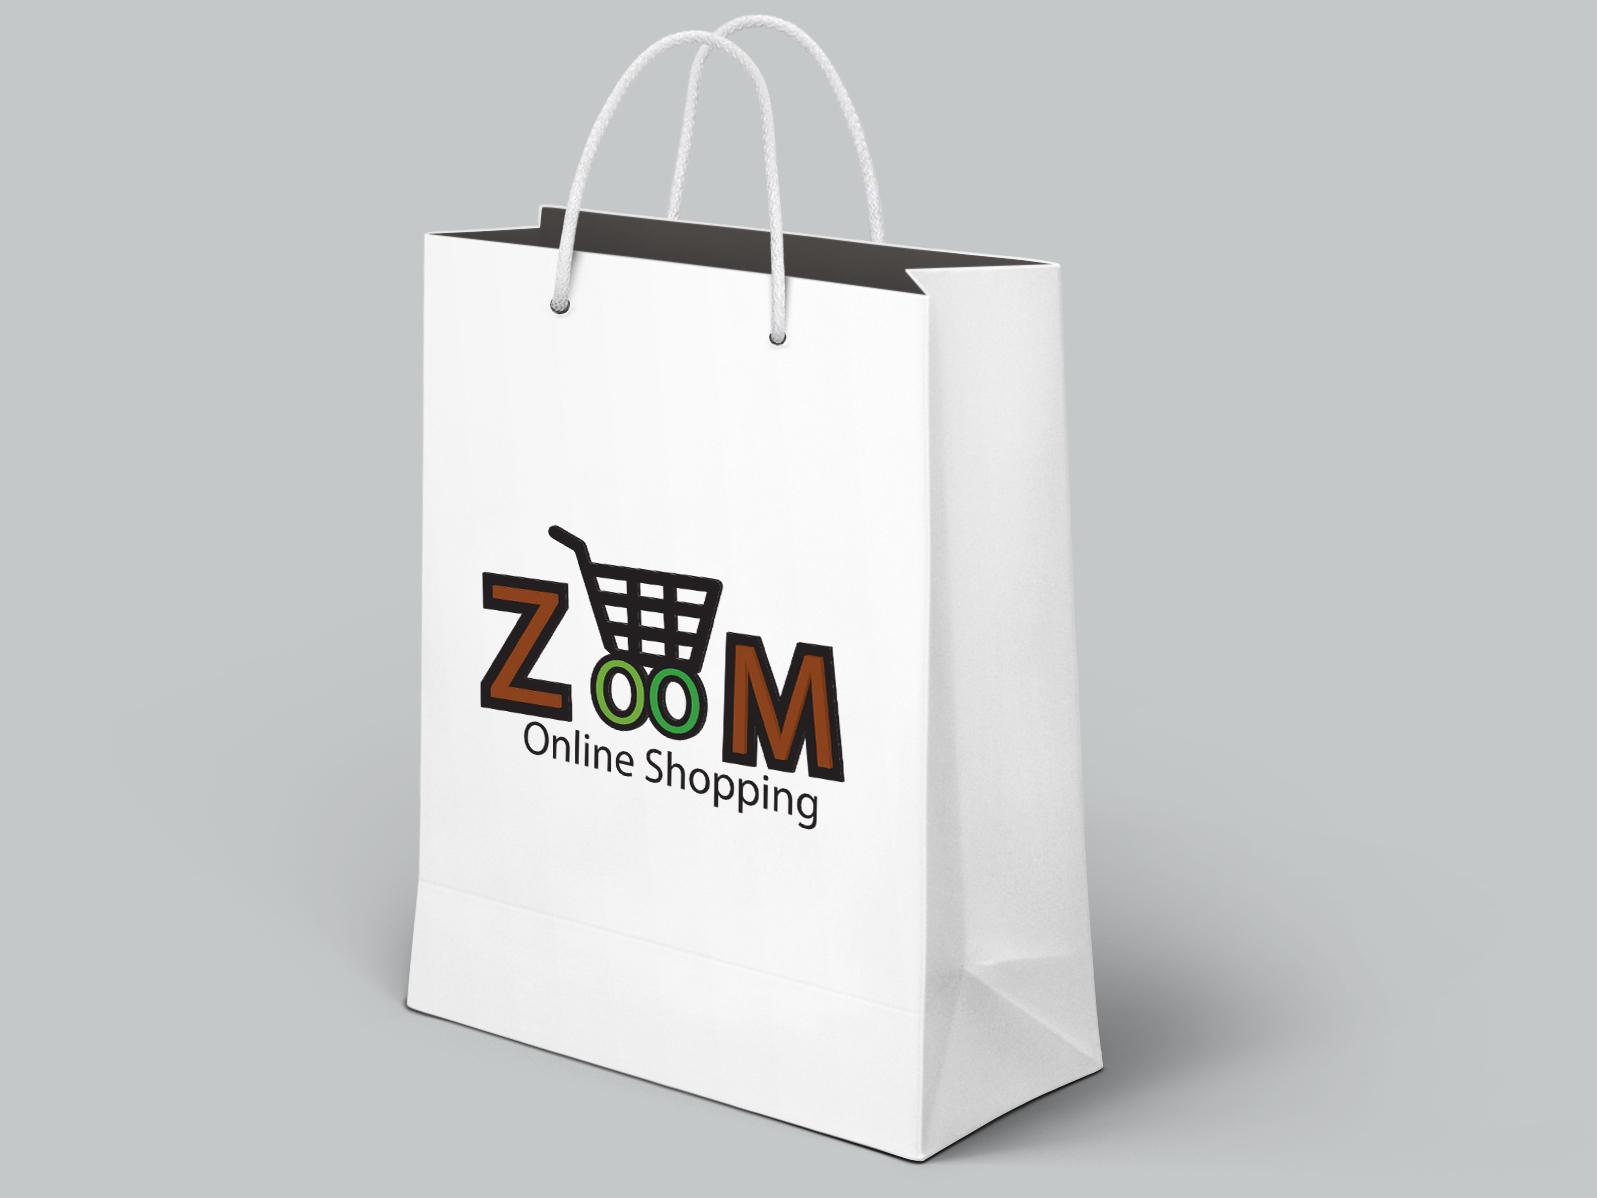 ONLINE SHOP LOGO oo curt logo zoom shop logo online shop logo zoom logo